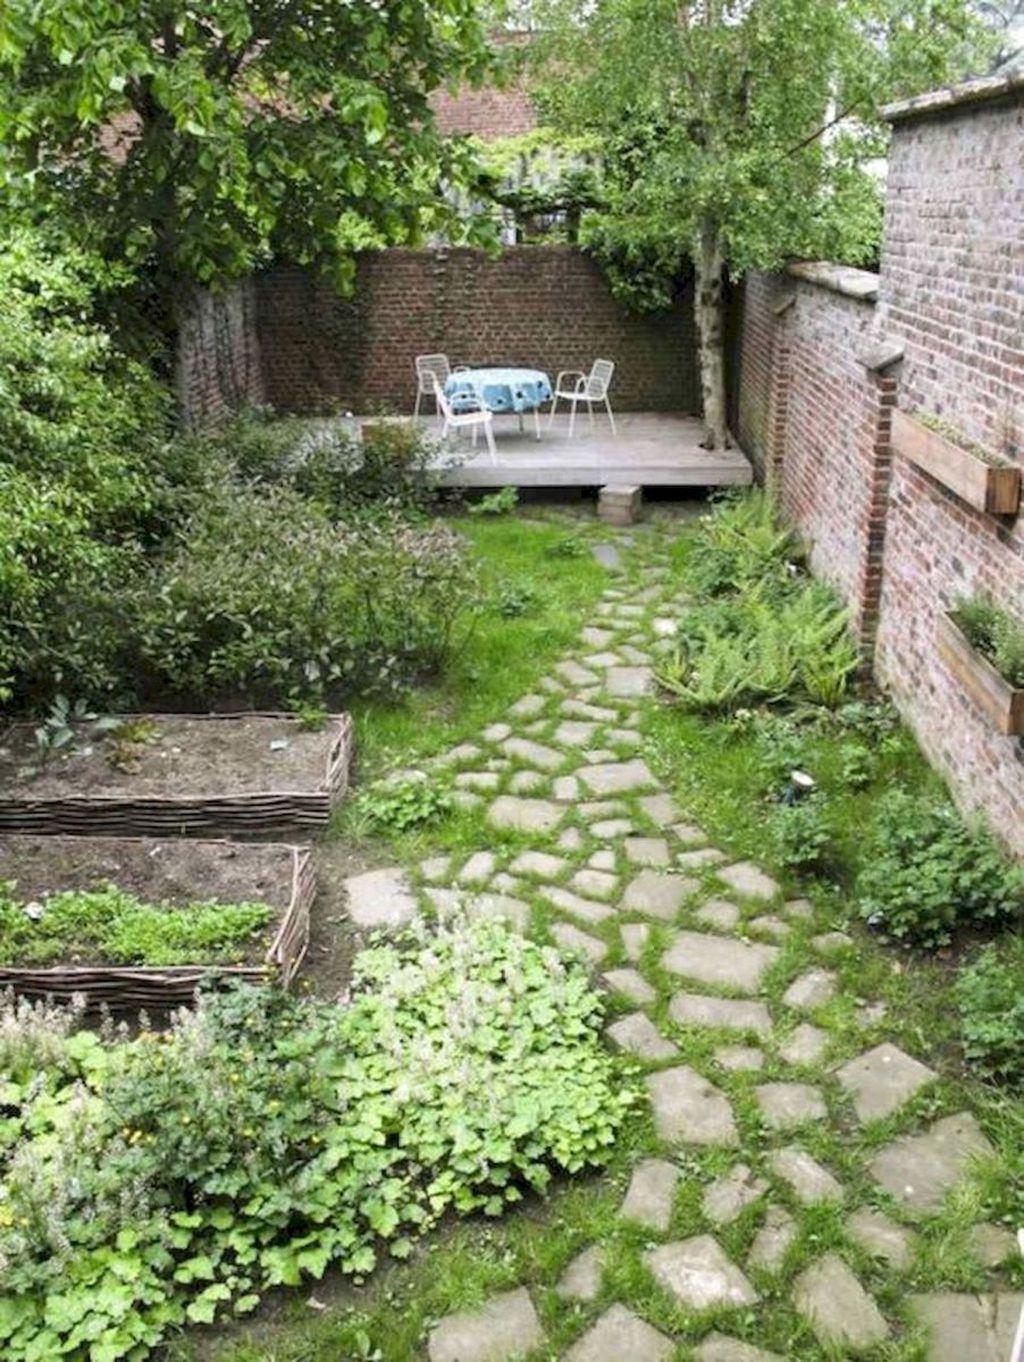 The Best Urban Garden Design Ideas For Your Backyard 26